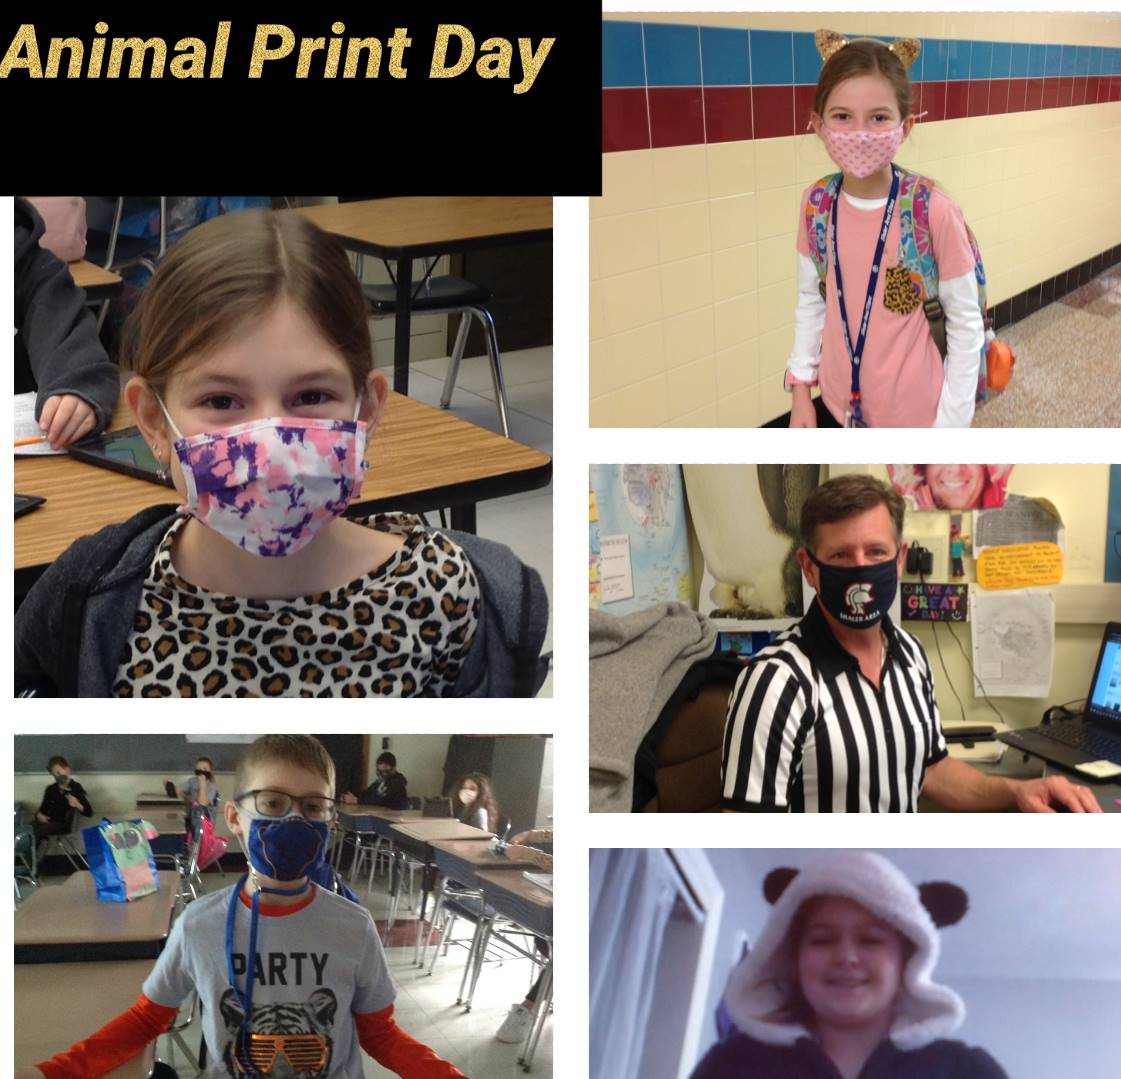 Animal Print Day